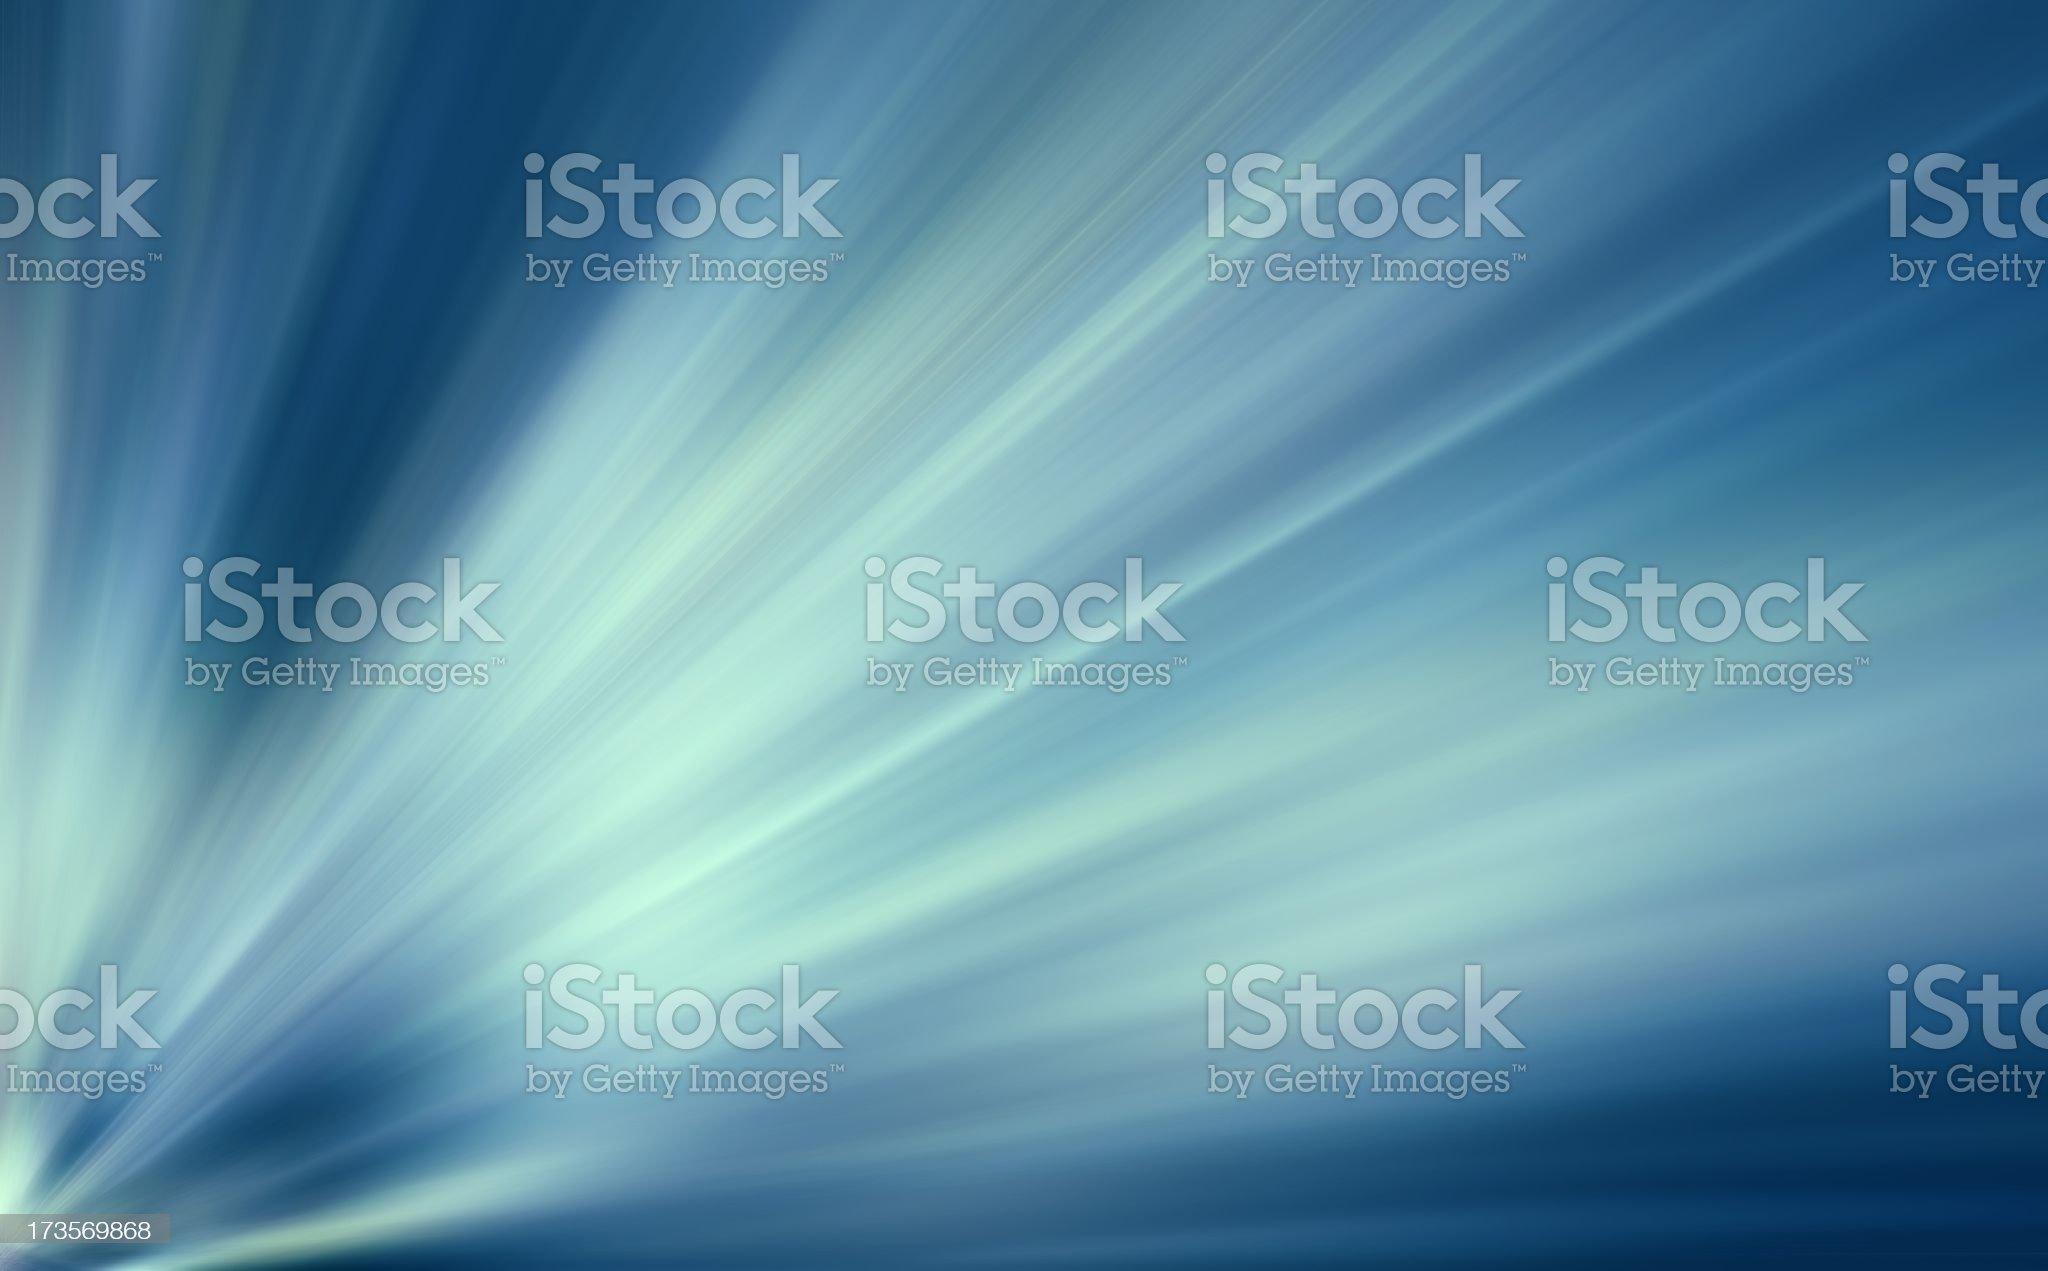 Bluish fractal background design royalty-free stock photo